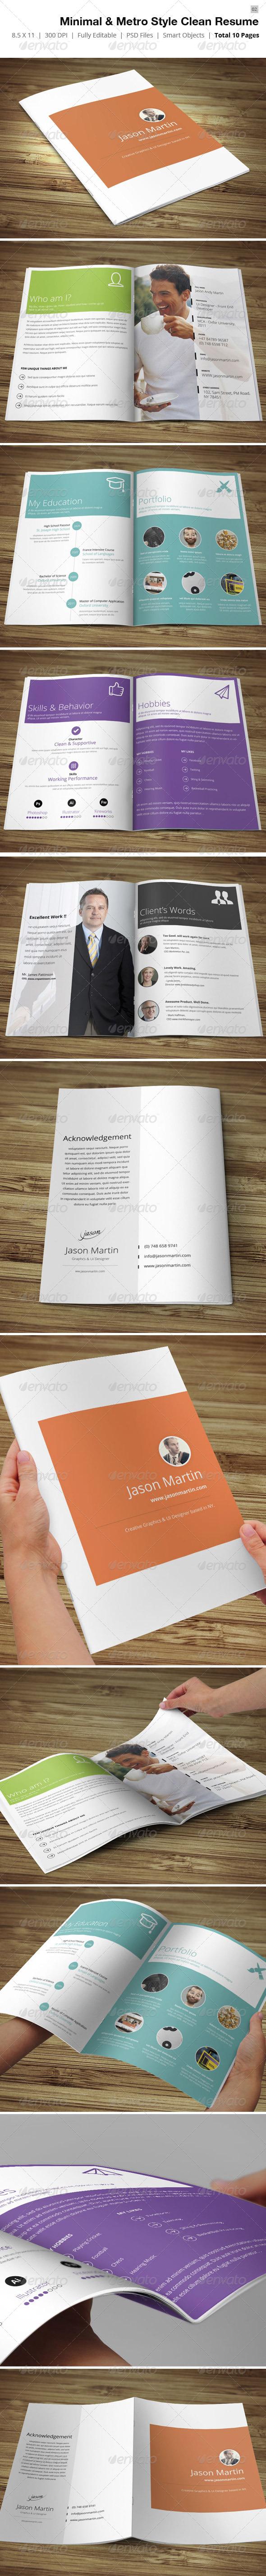 GraphicRiver Minimal & Metro Style Resume 4311194